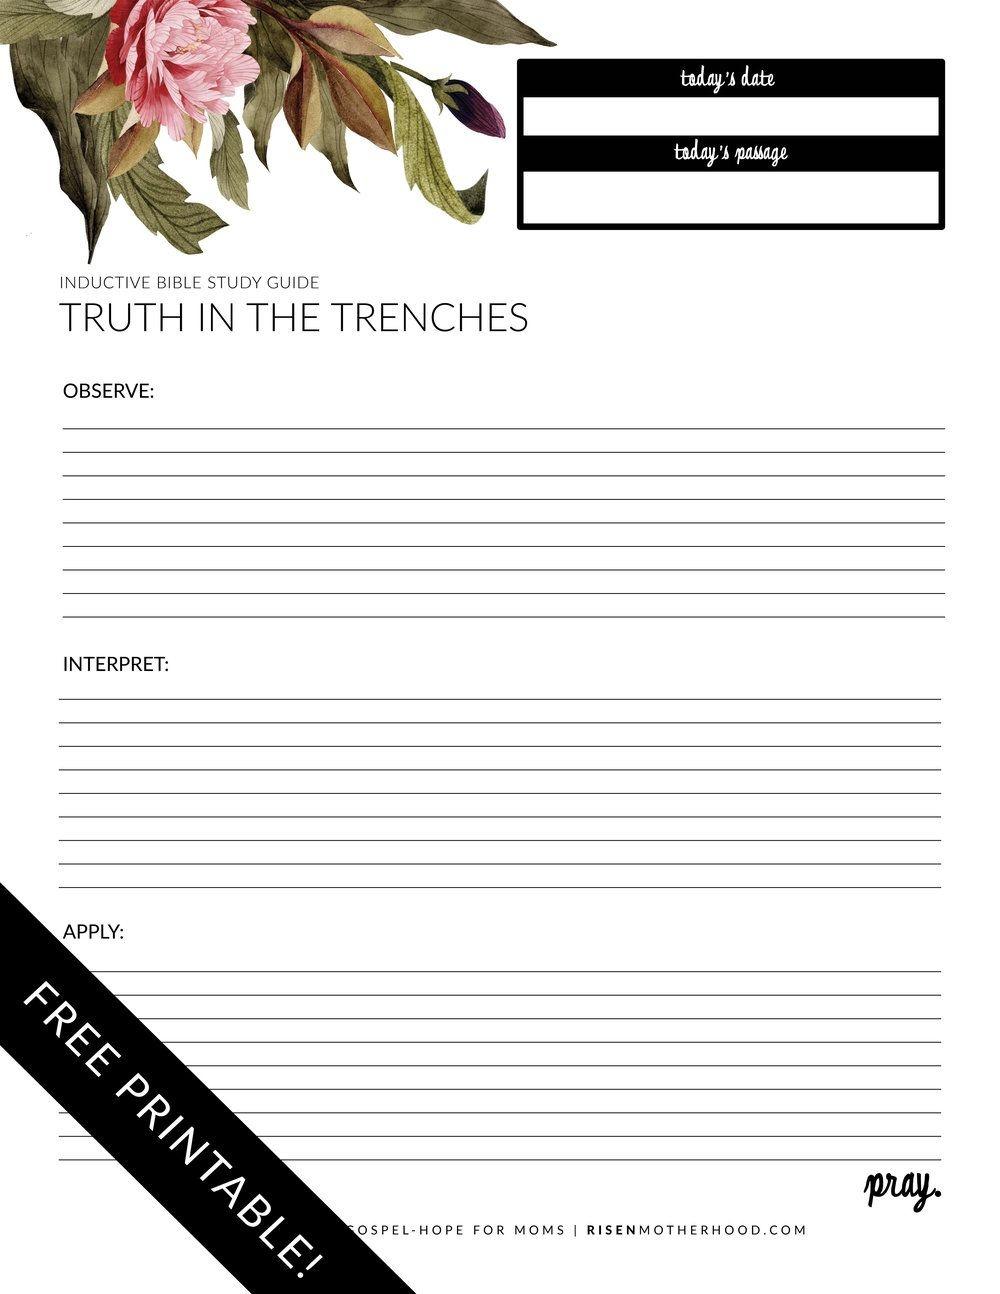 Free Printable: Inductive Bible Study Worksheets & Companion Card - Free Printable Bible Study Guides